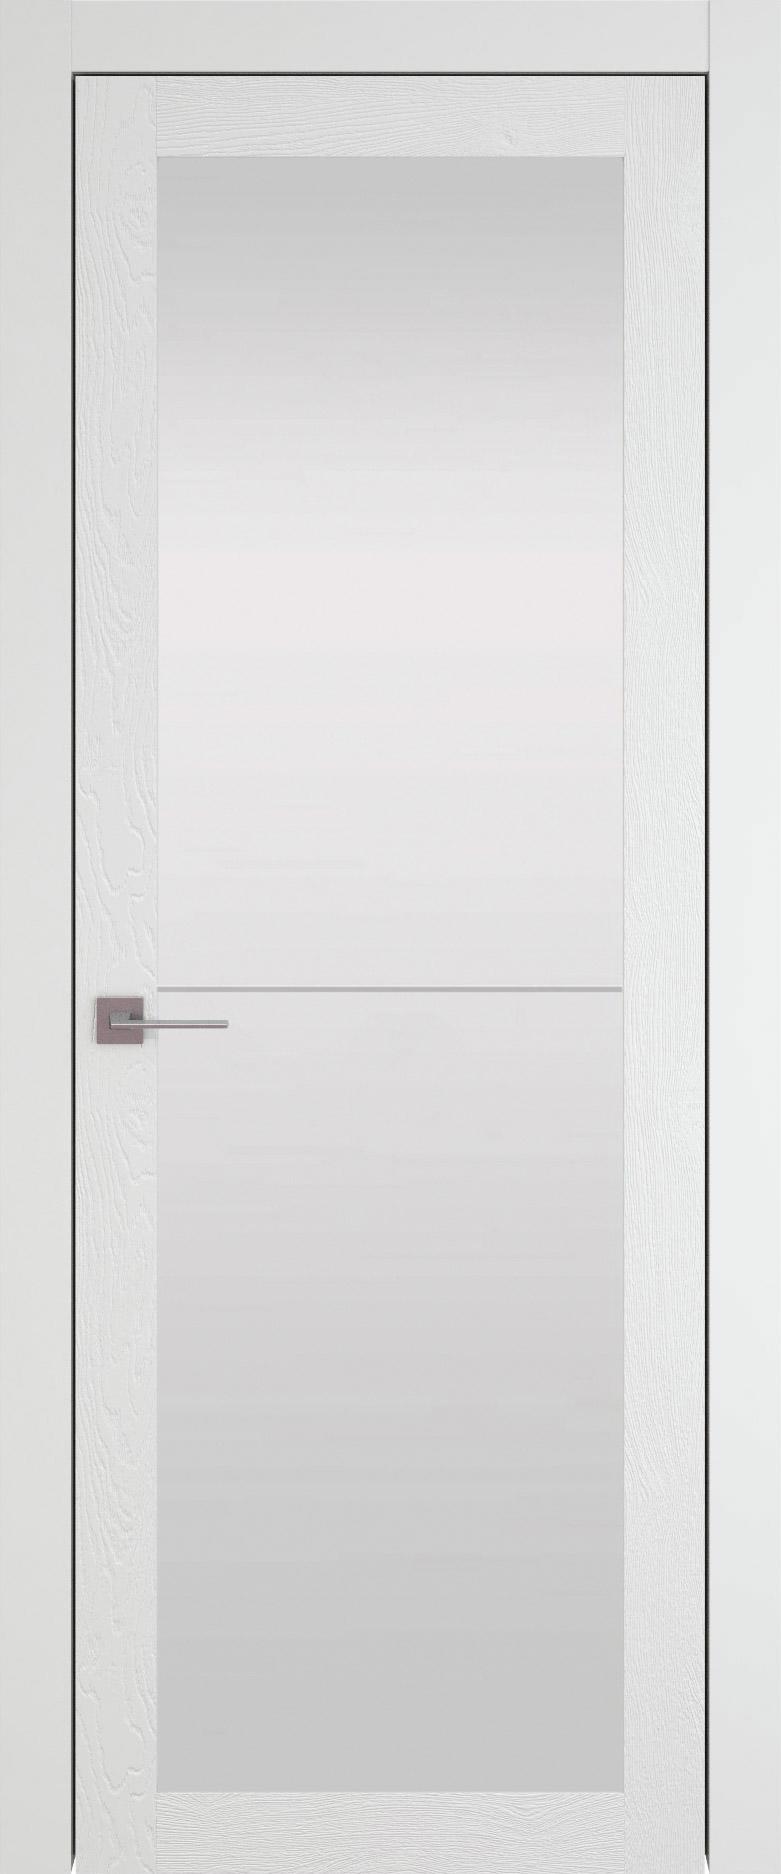 Tivoli З-2 цвет - Белая эмаль по шпону (RAL 9003) Со стеклом (ДО)